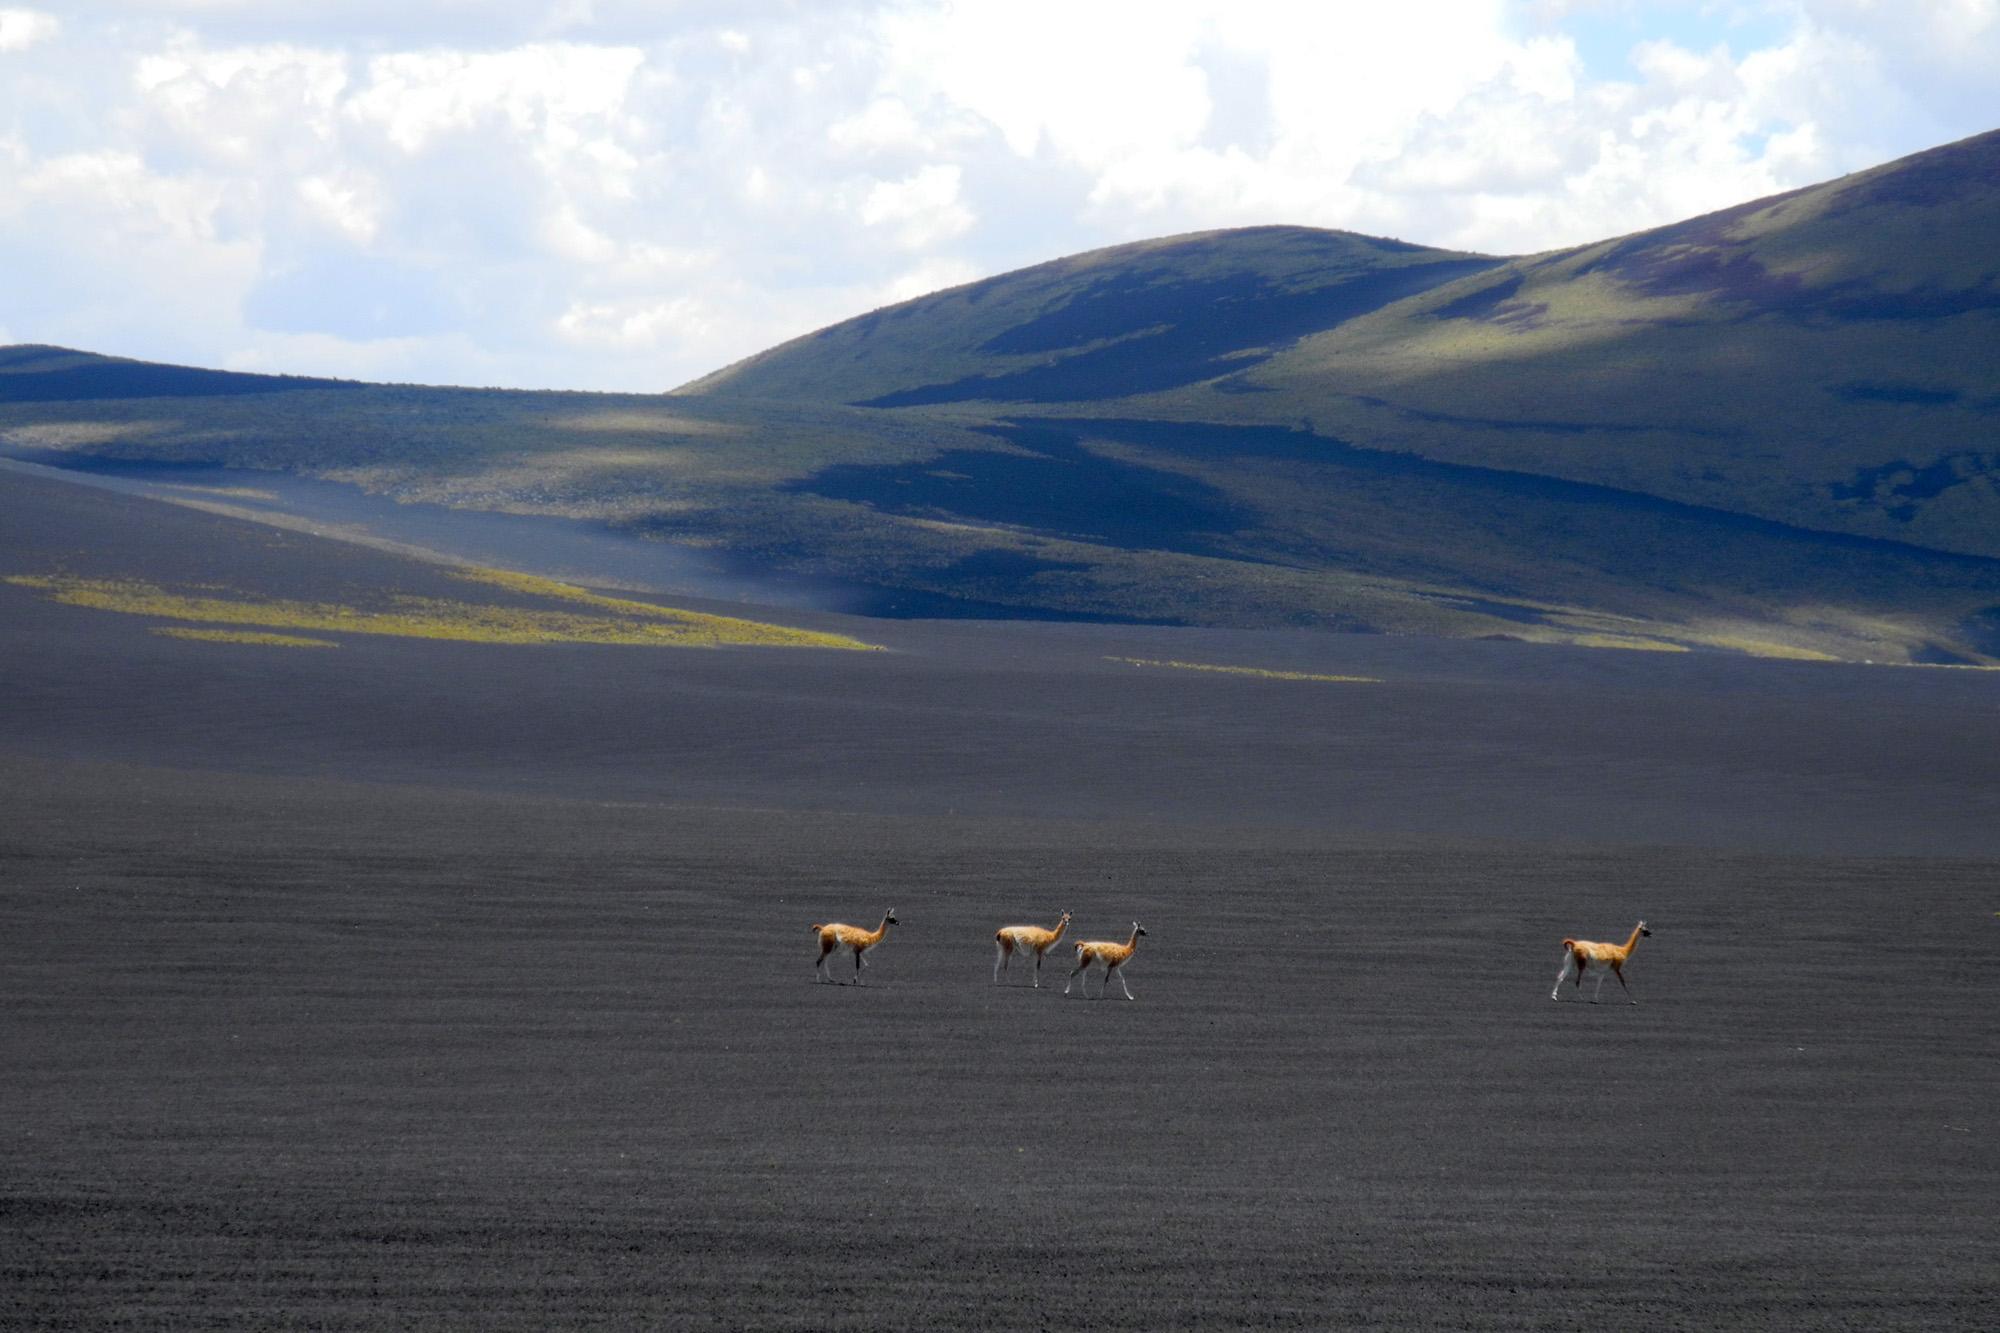 wine-TROTTERS_oenotourisme_wine-tourism-agency_tour_vino_vin_turismo_ARGENTINA_Mendoza_trekking_hiking_horseback-riding_alta-montana_Andes_16_WEB-2000px.jpg